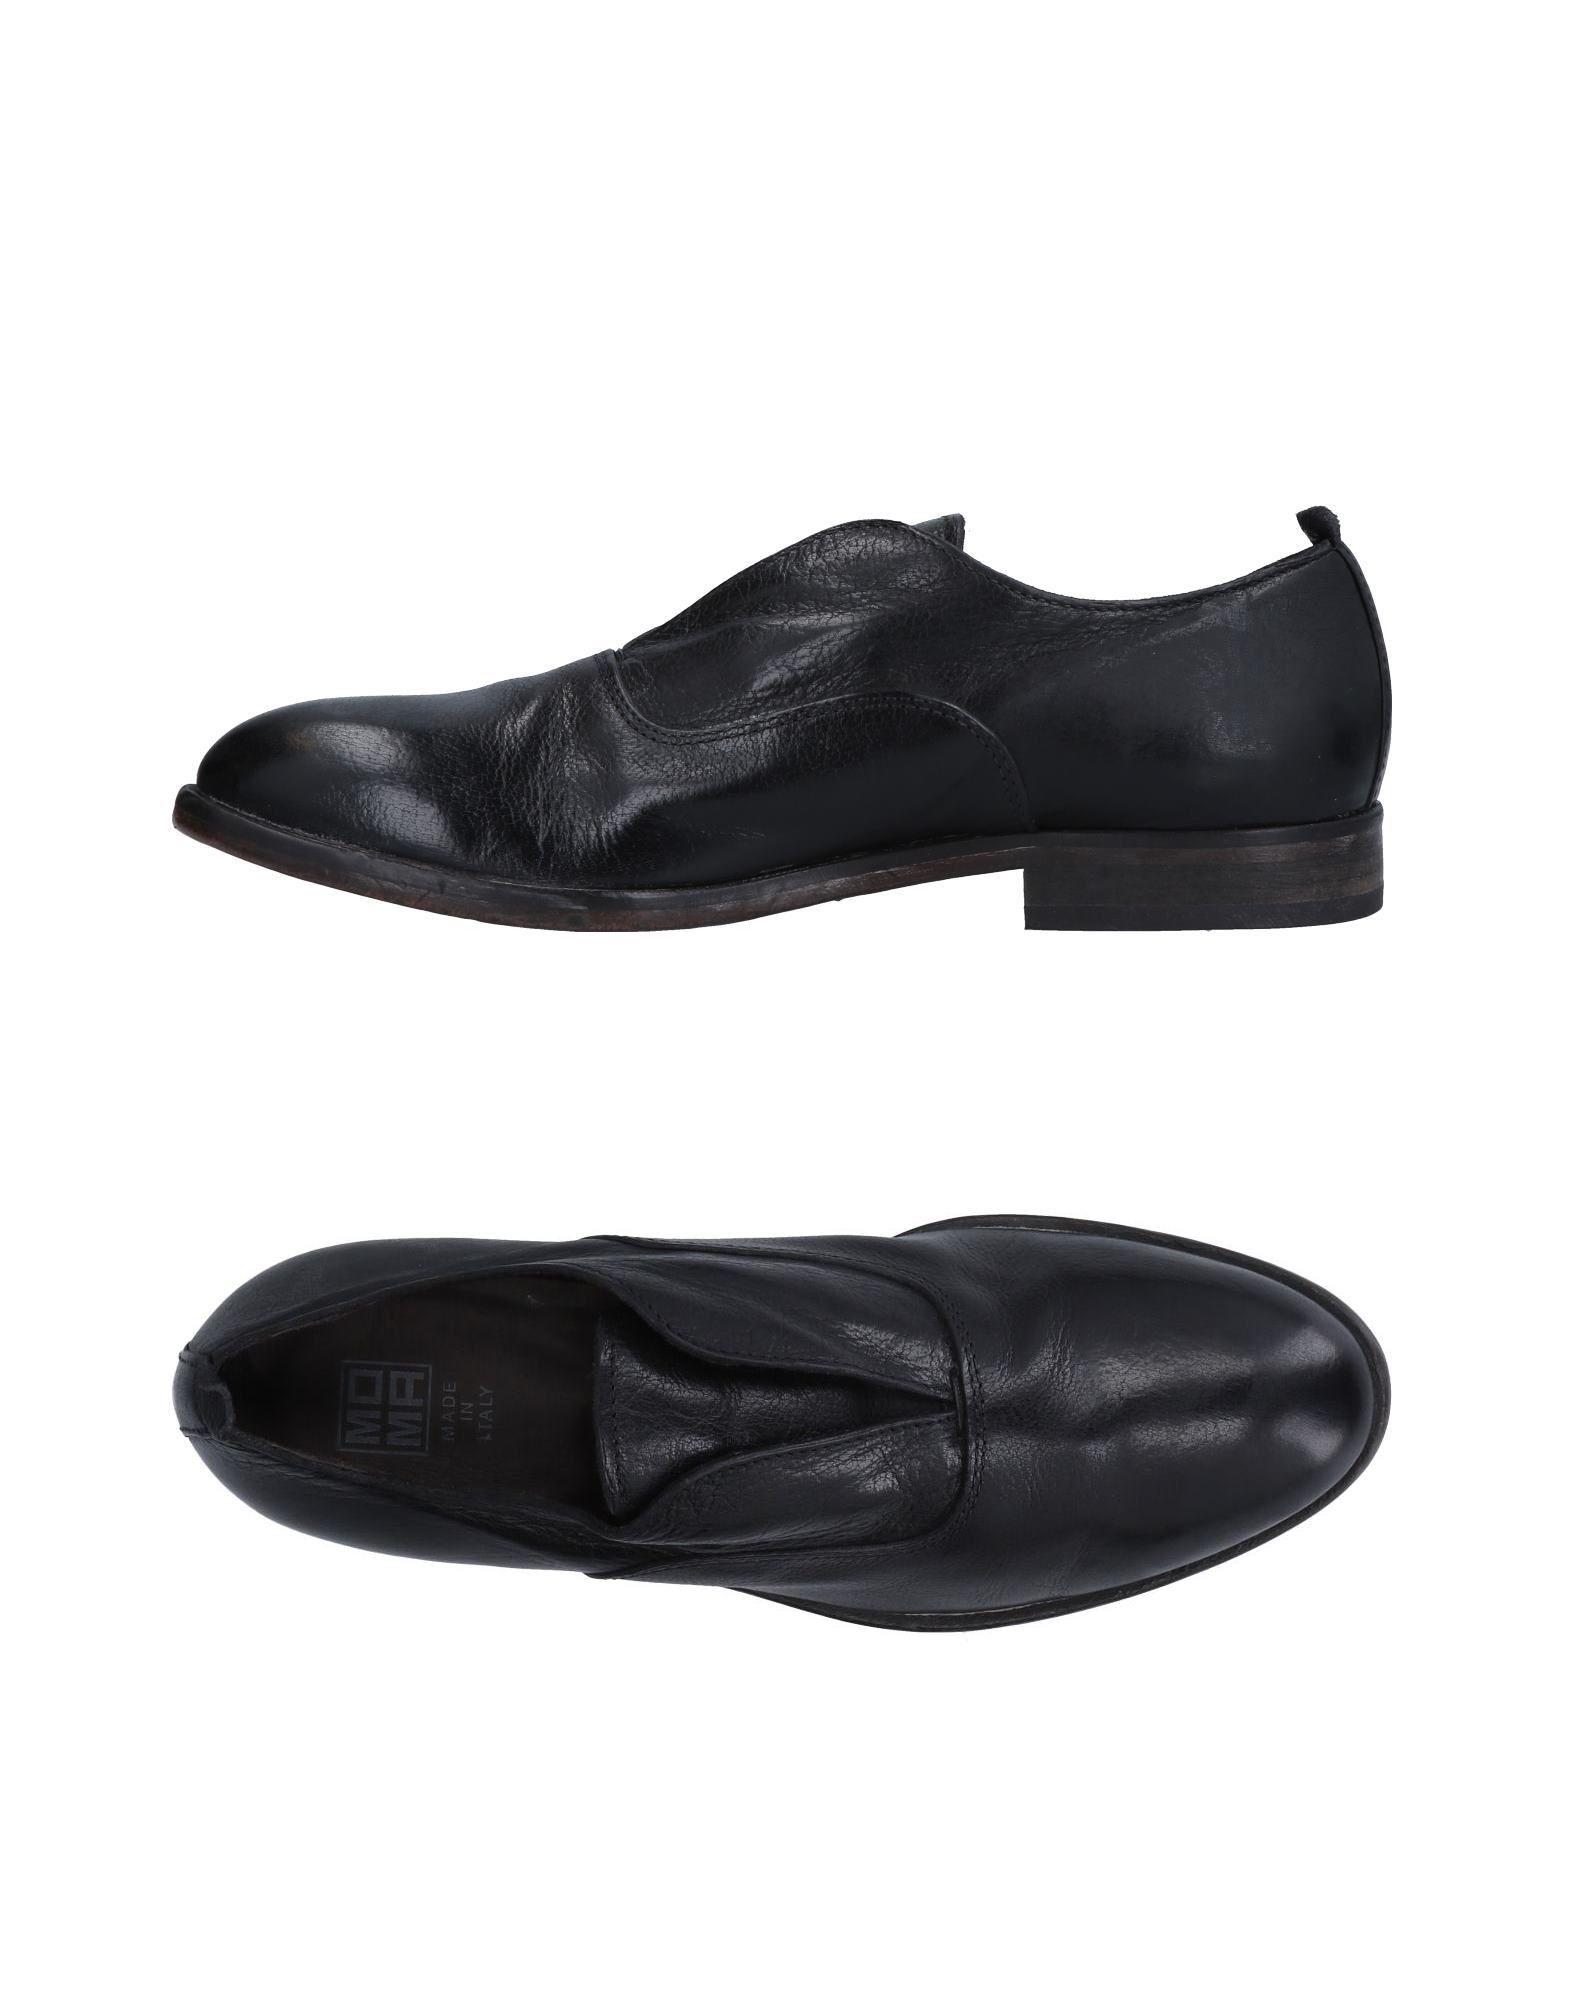 Moma Mokassins Qualität Herren  11508663JJ Gute Qualität Mokassins beliebte Schuhe 16bcd7